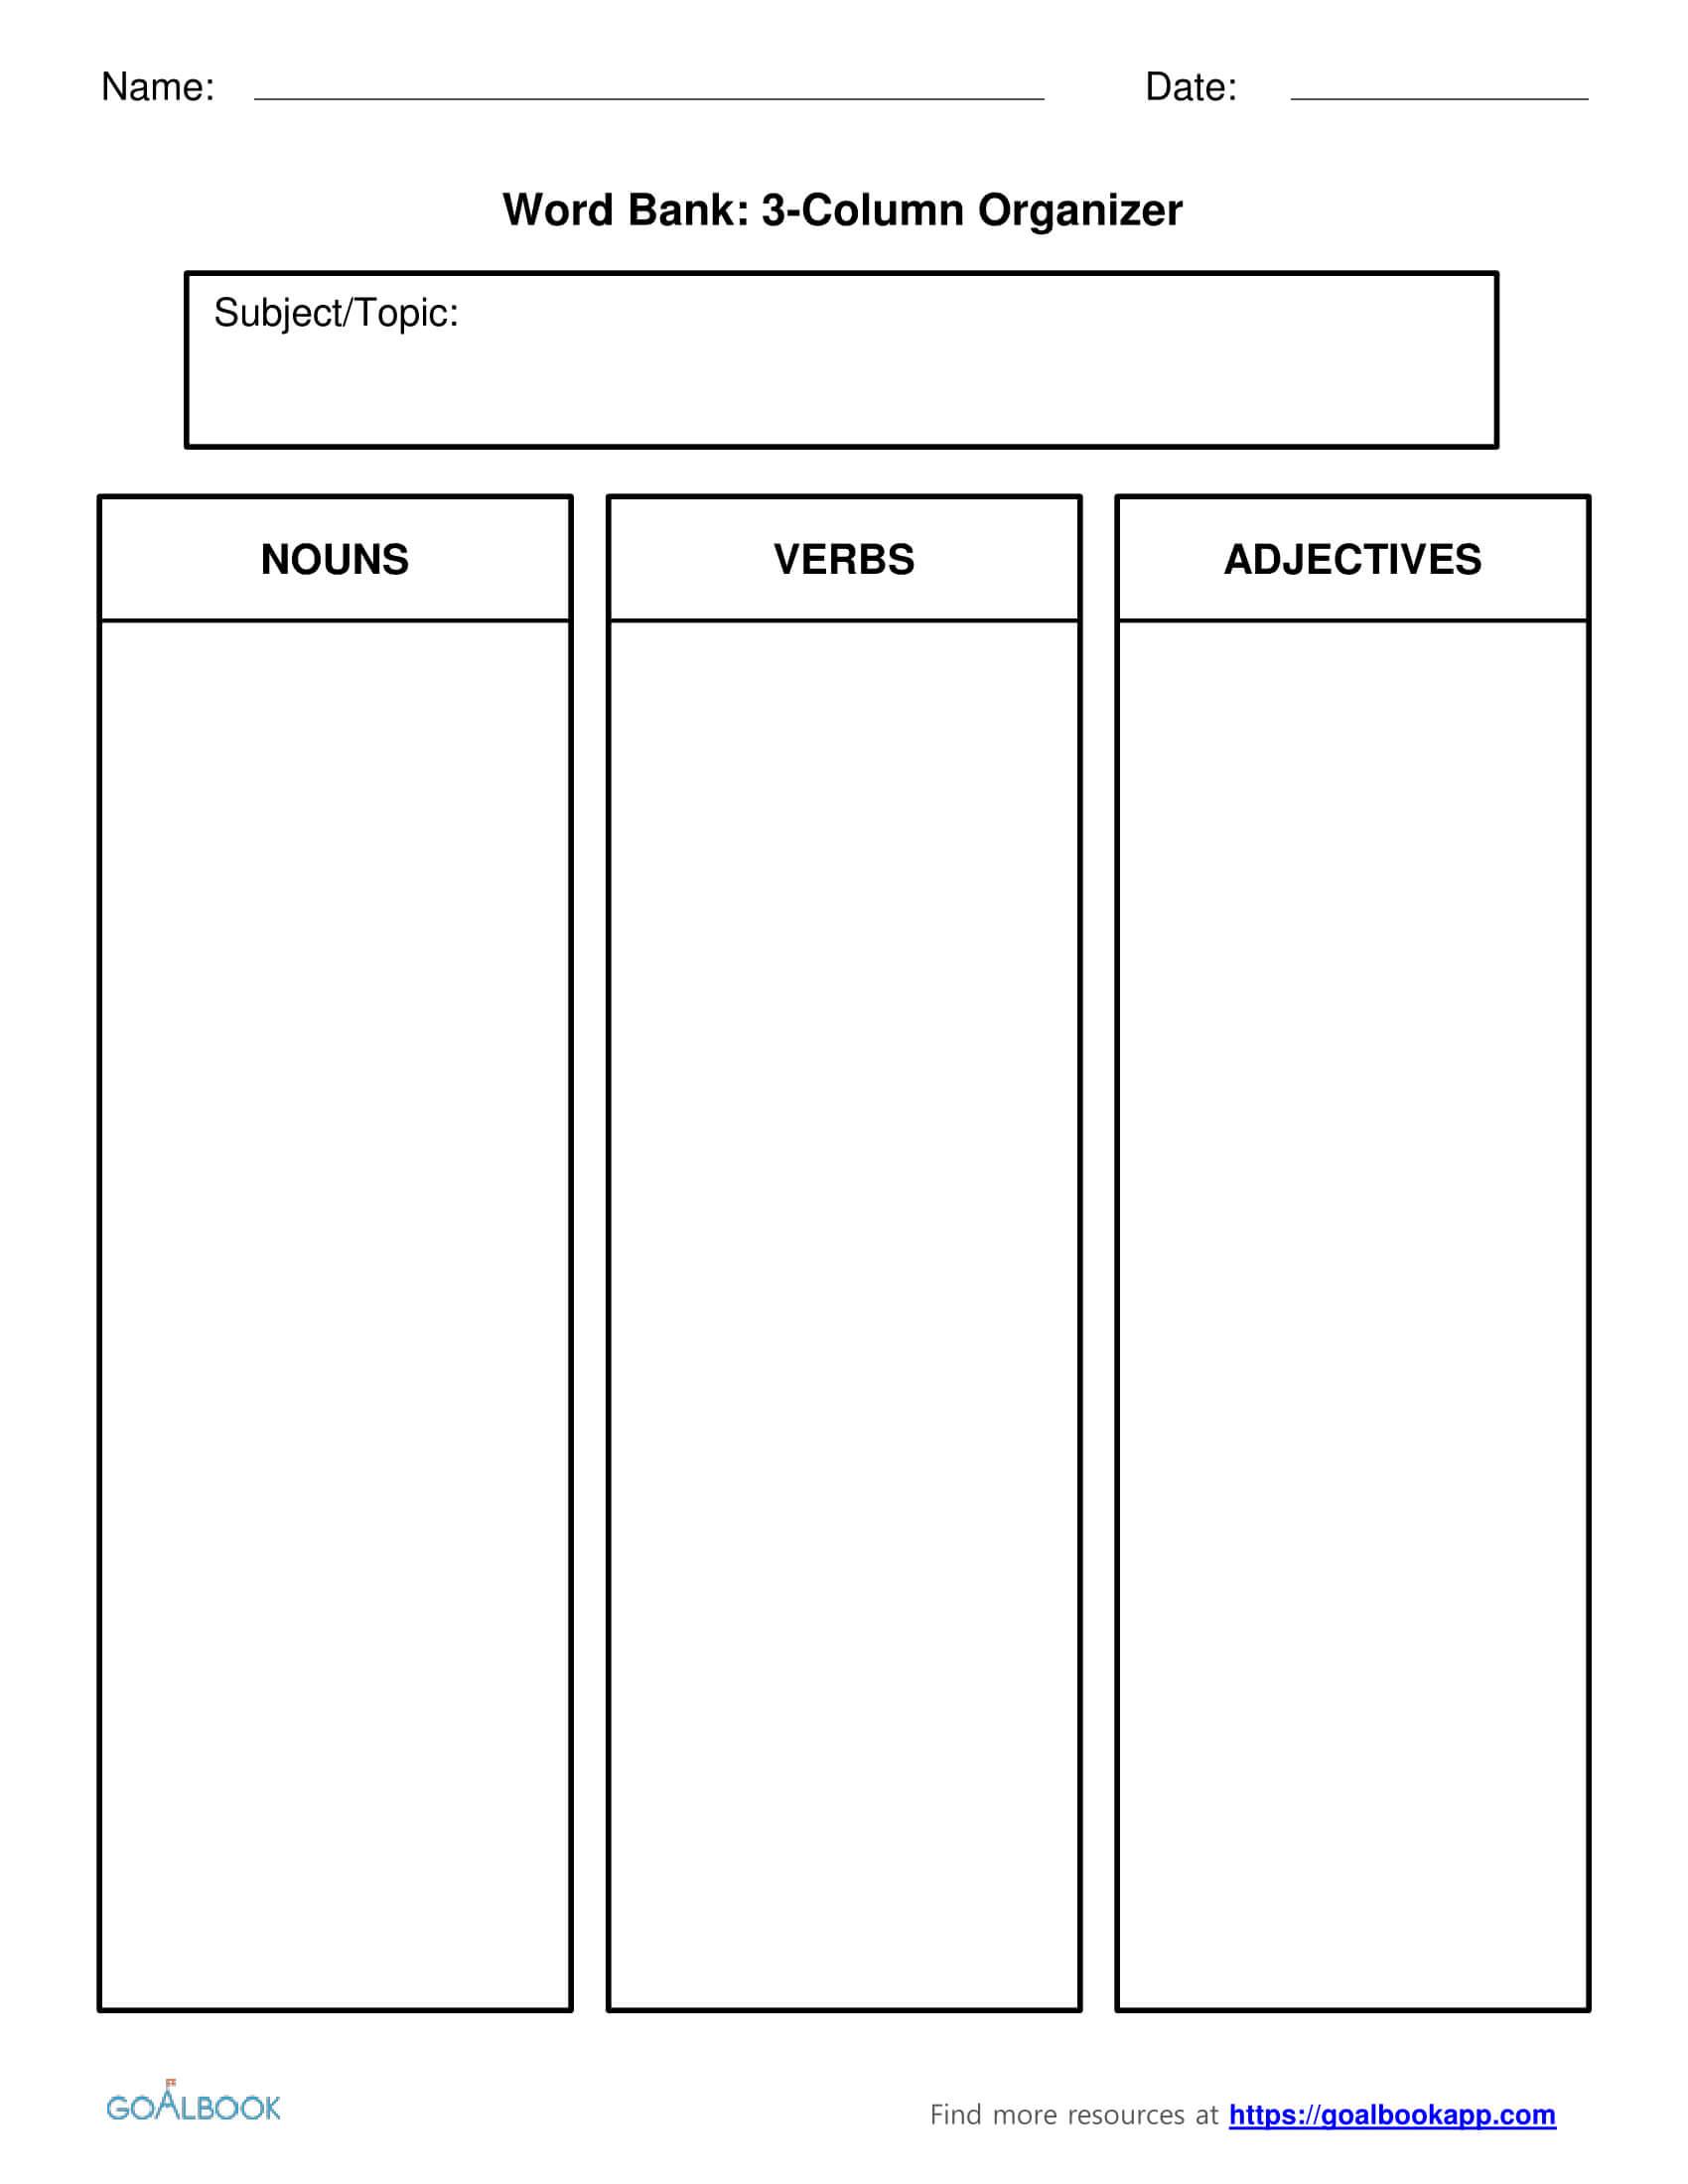 Word Bank | Udl Strategies - Goalbook Toolkit Within 3 Column Word Template